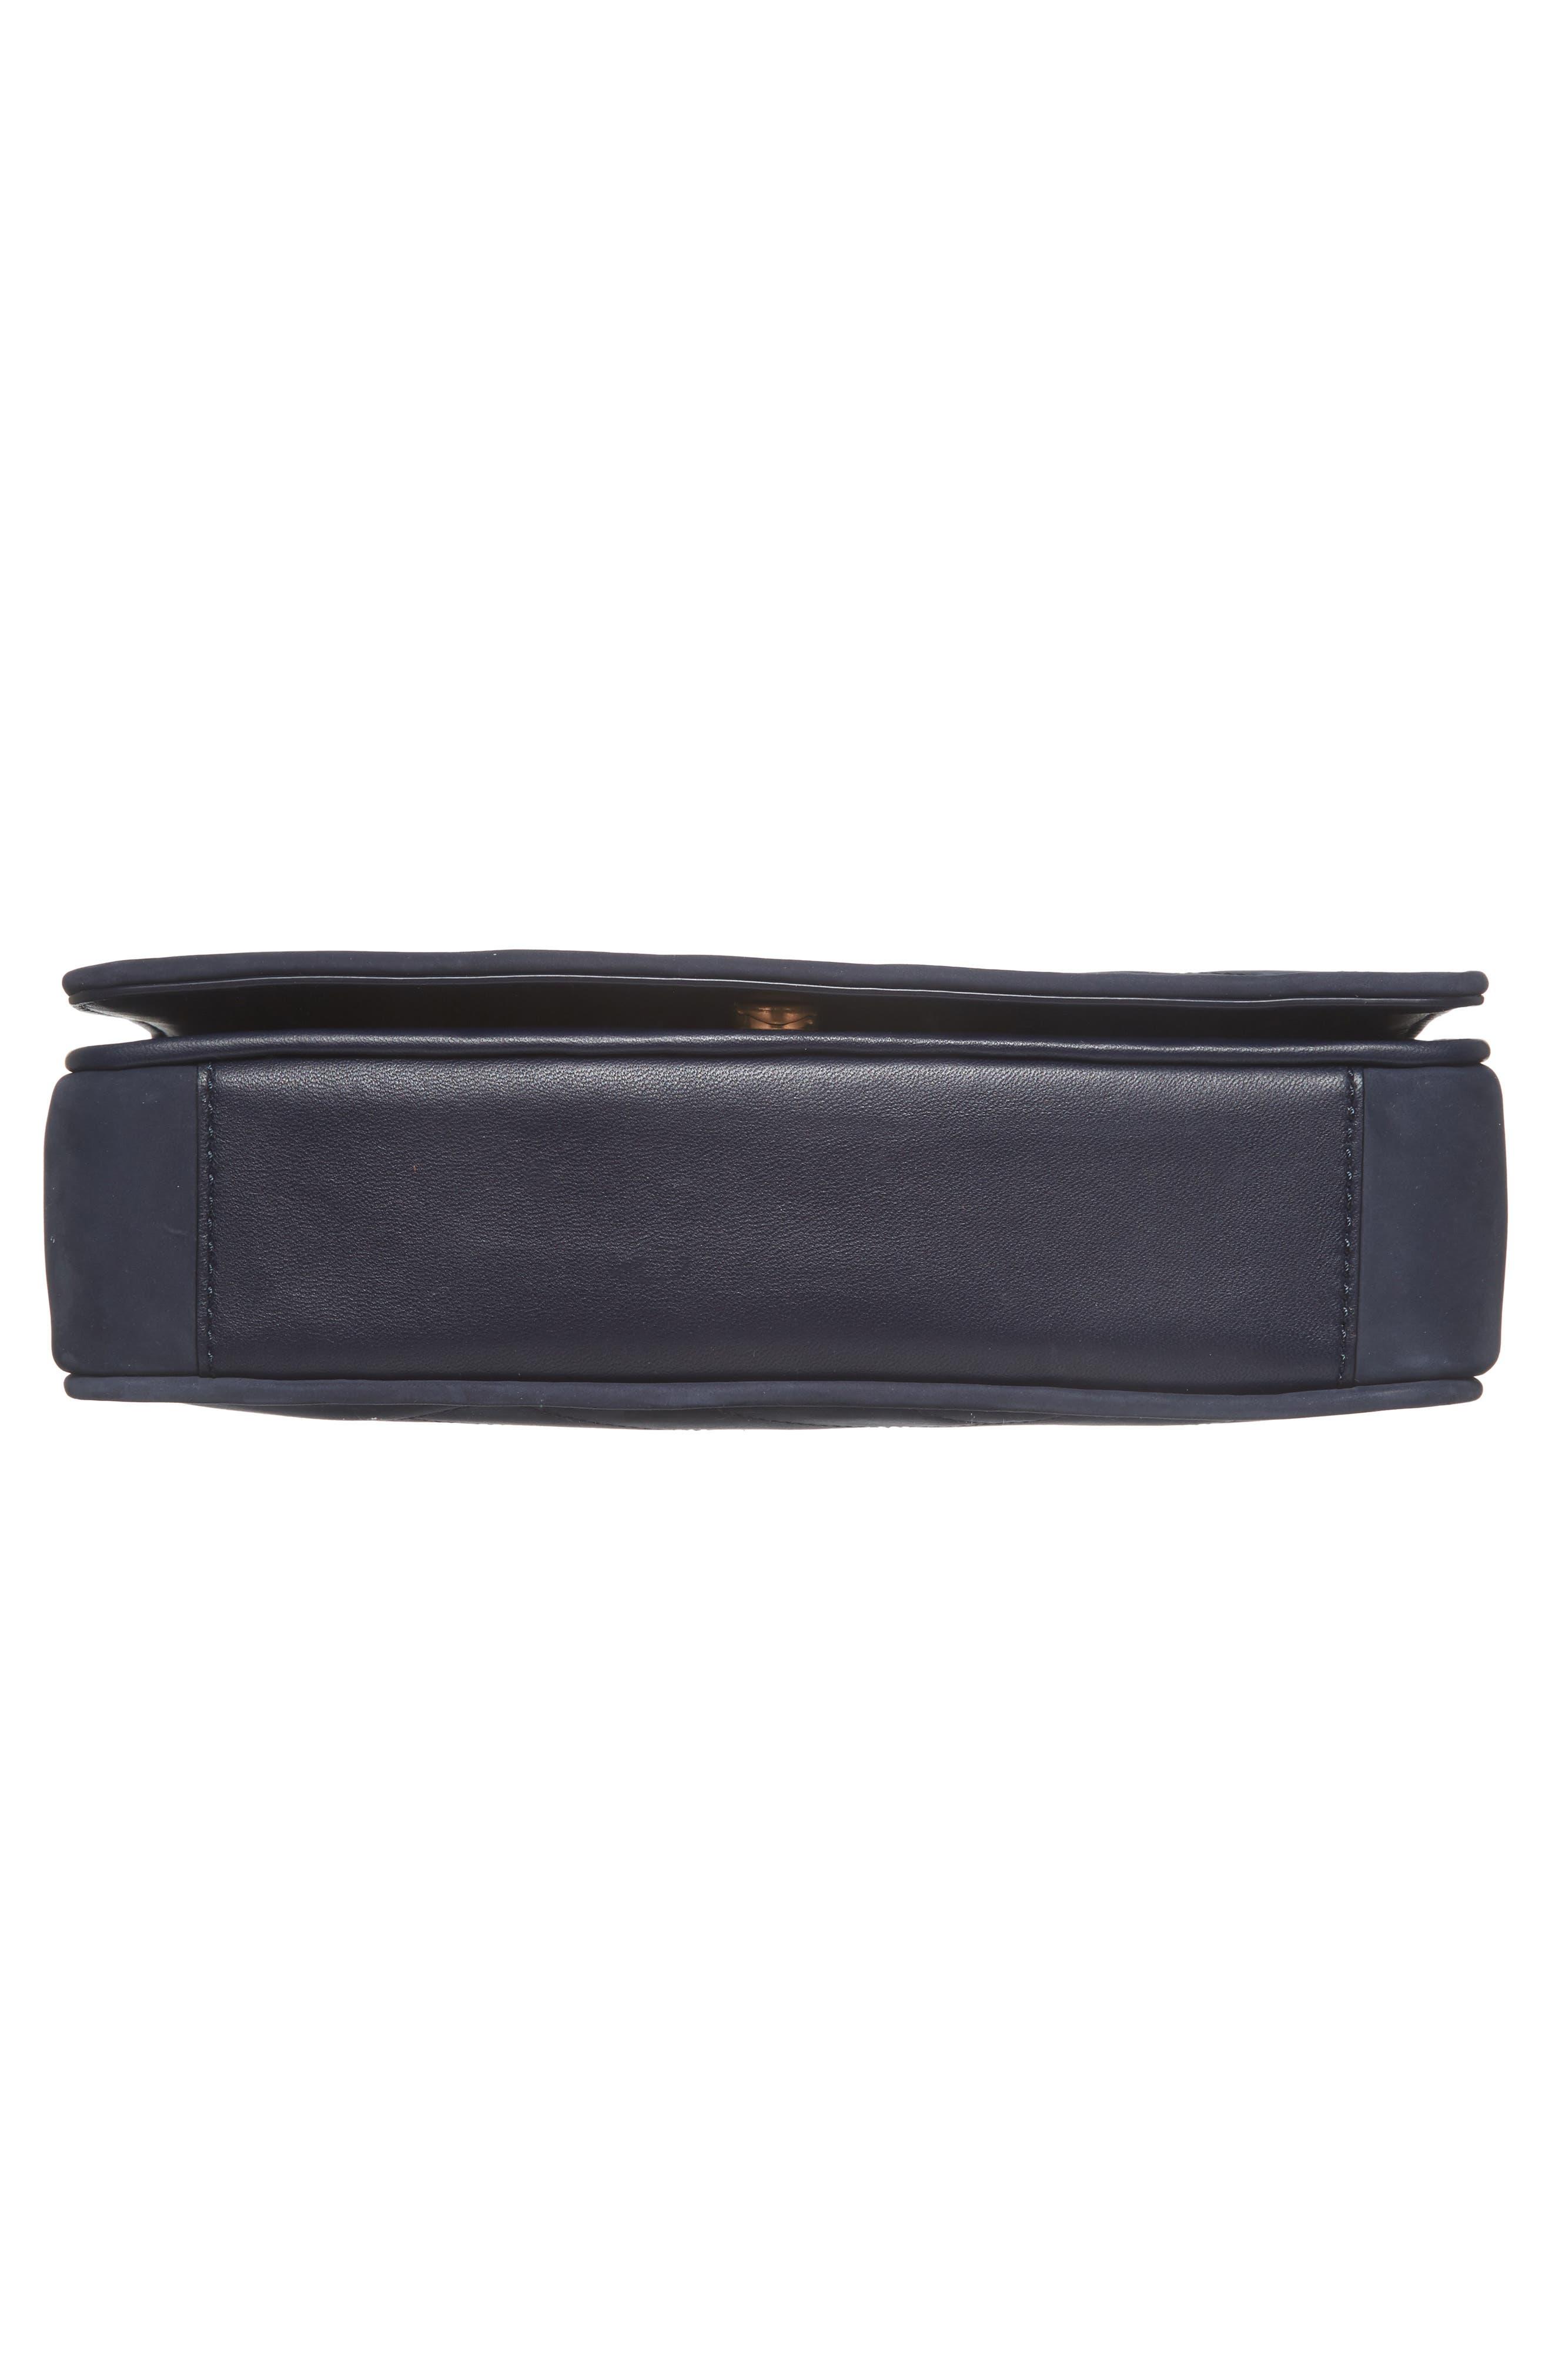 Alexa Leather Shoulder Bag,                             Alternate thumbnail 6, color,                             403